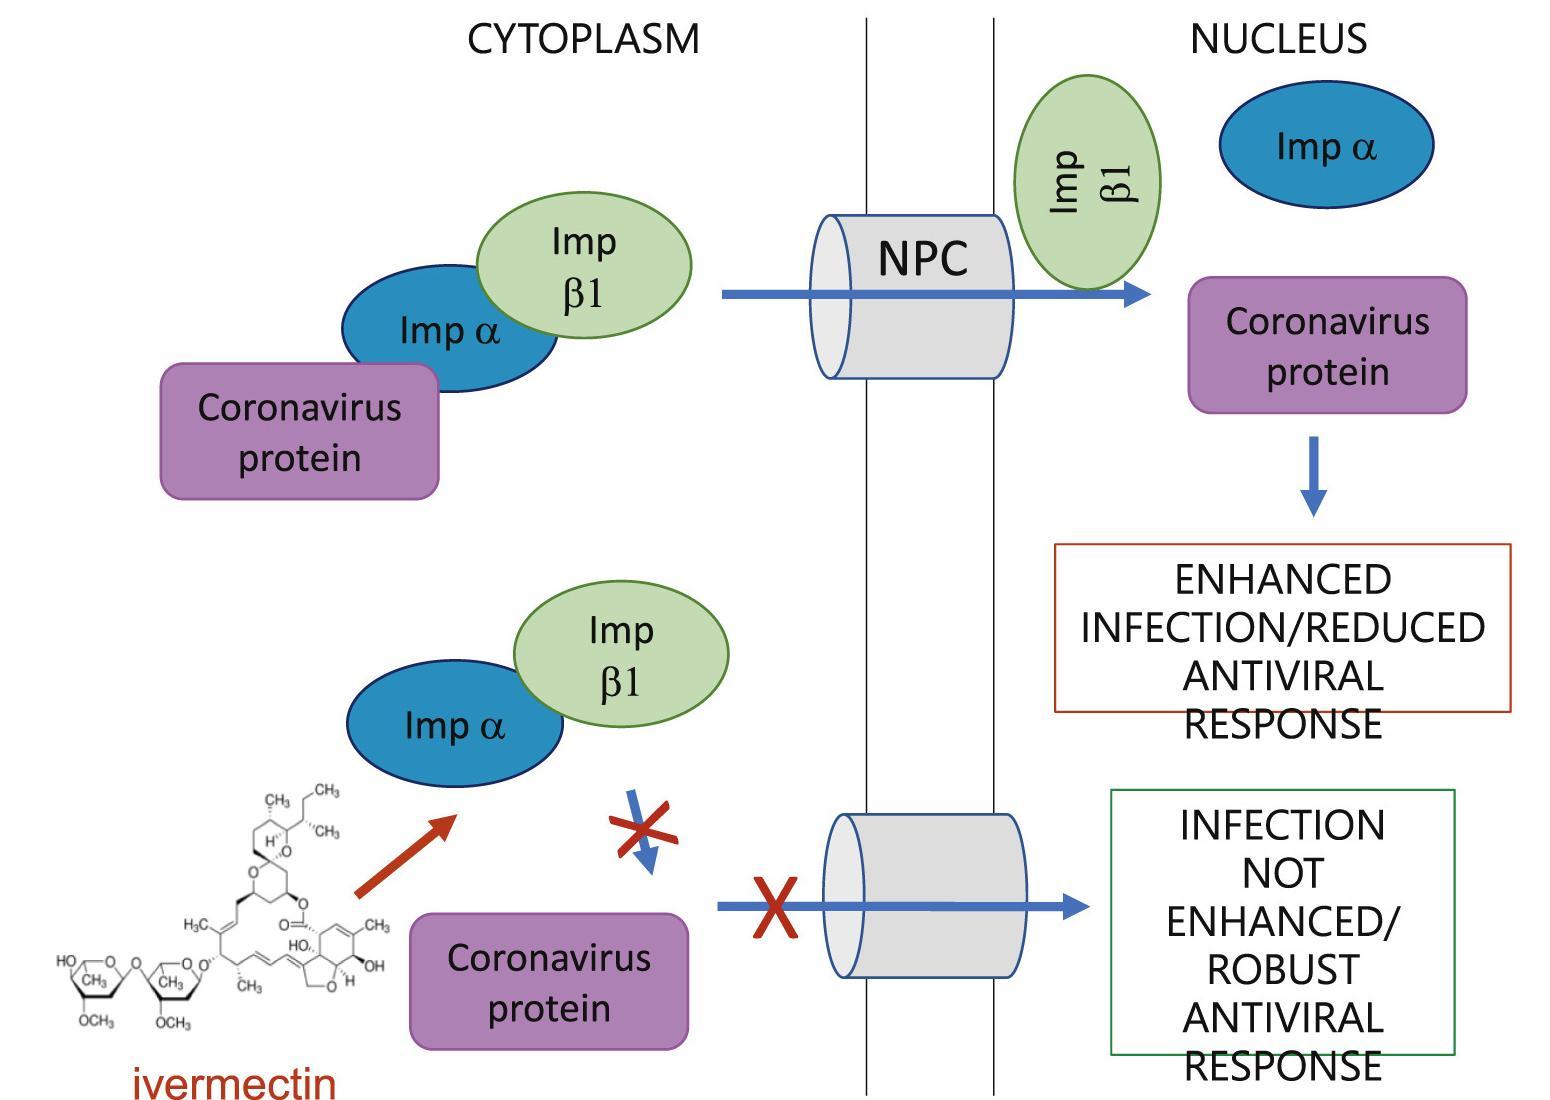 Противопаразитарное средство оказалось эффективным in vitro против Covid-19